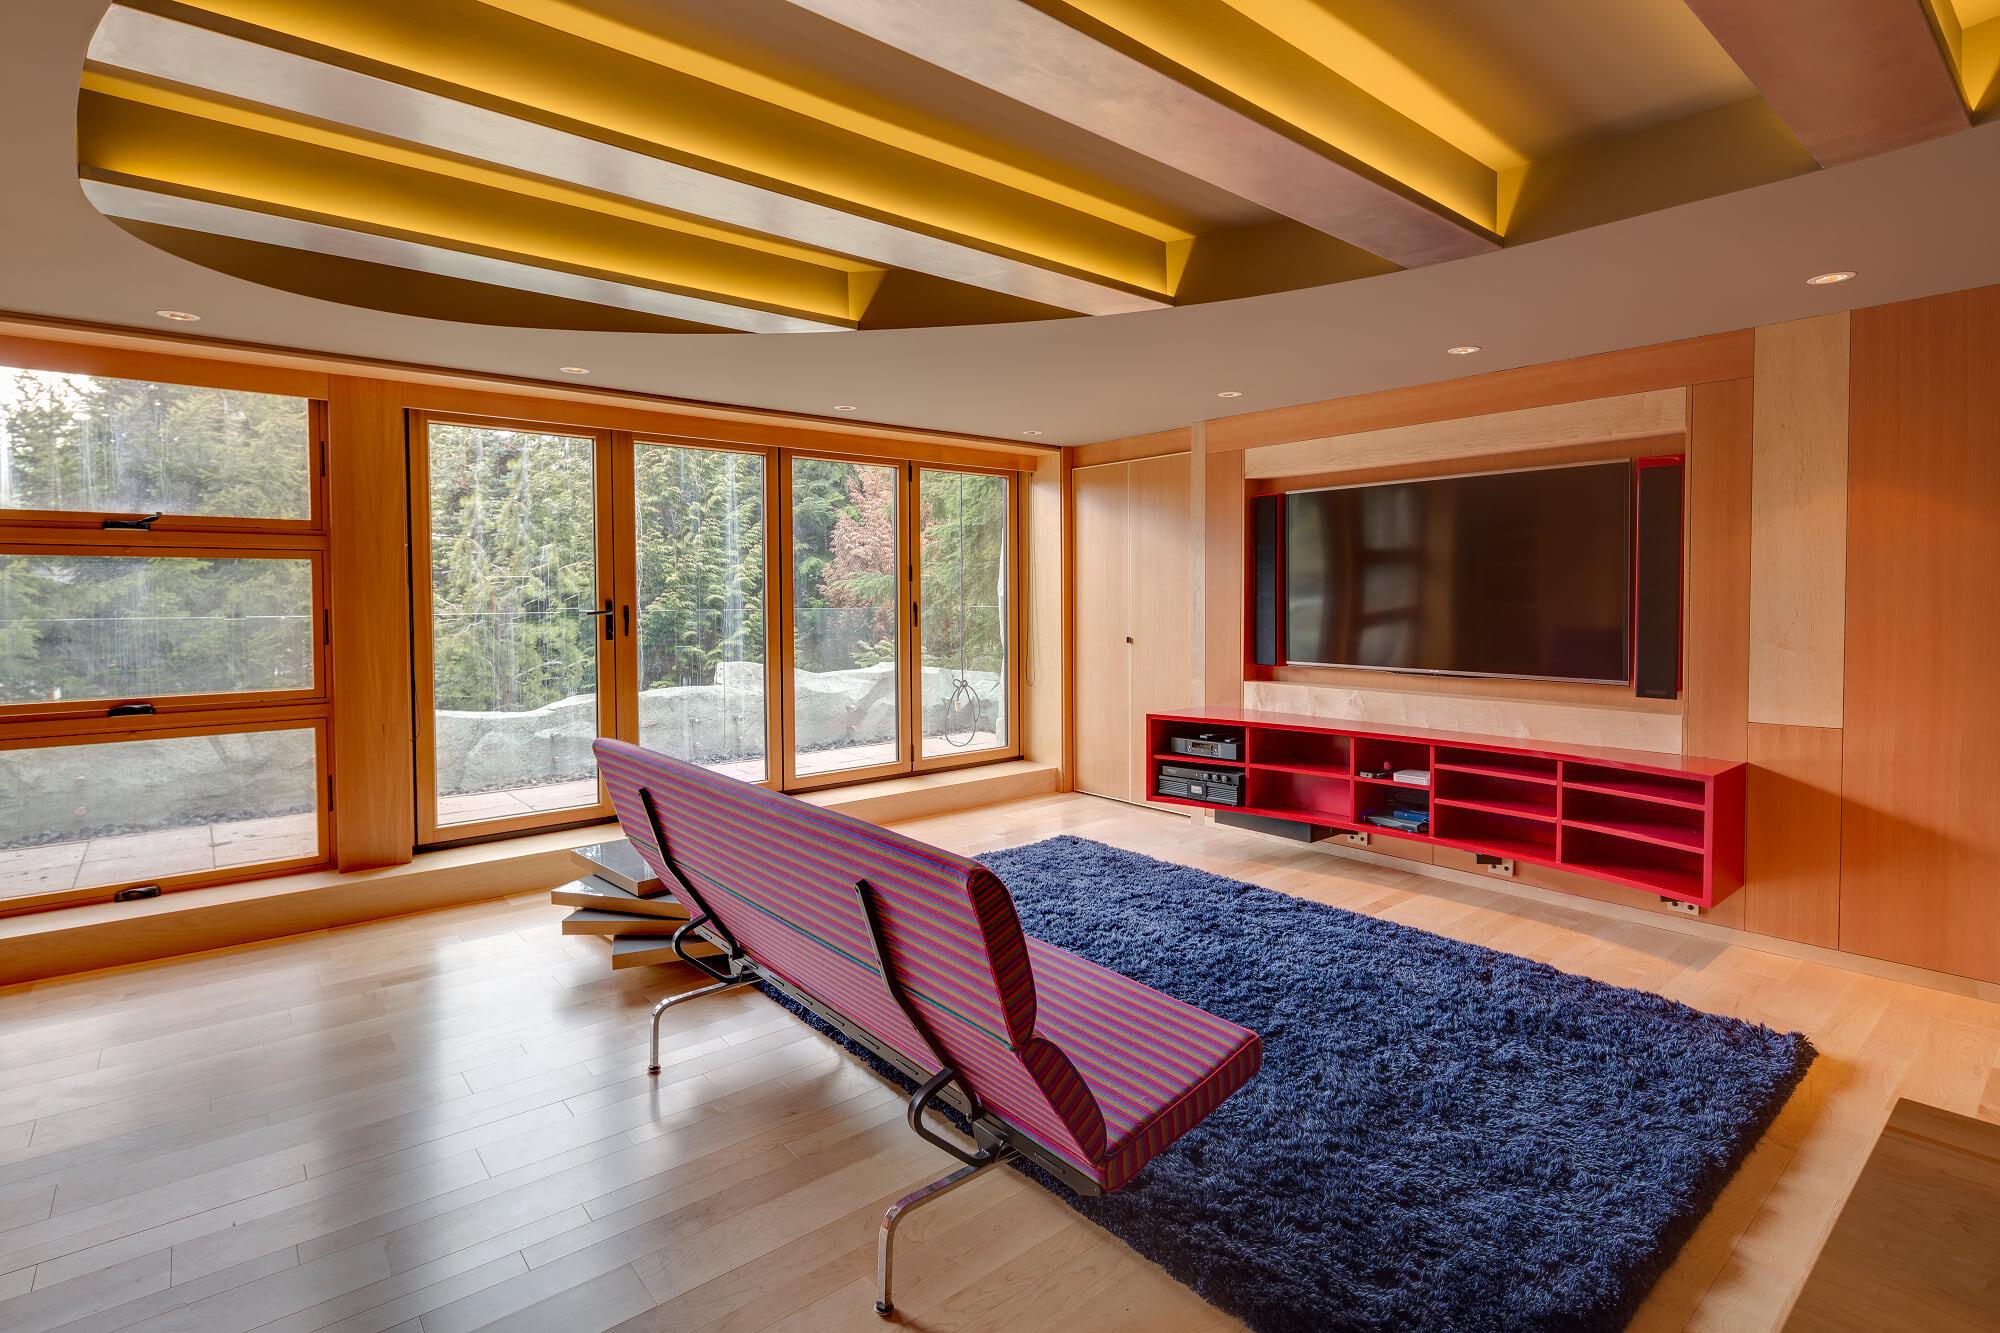 wsi-imageoptim-Home-TV-room-reno-Whistler.jpg